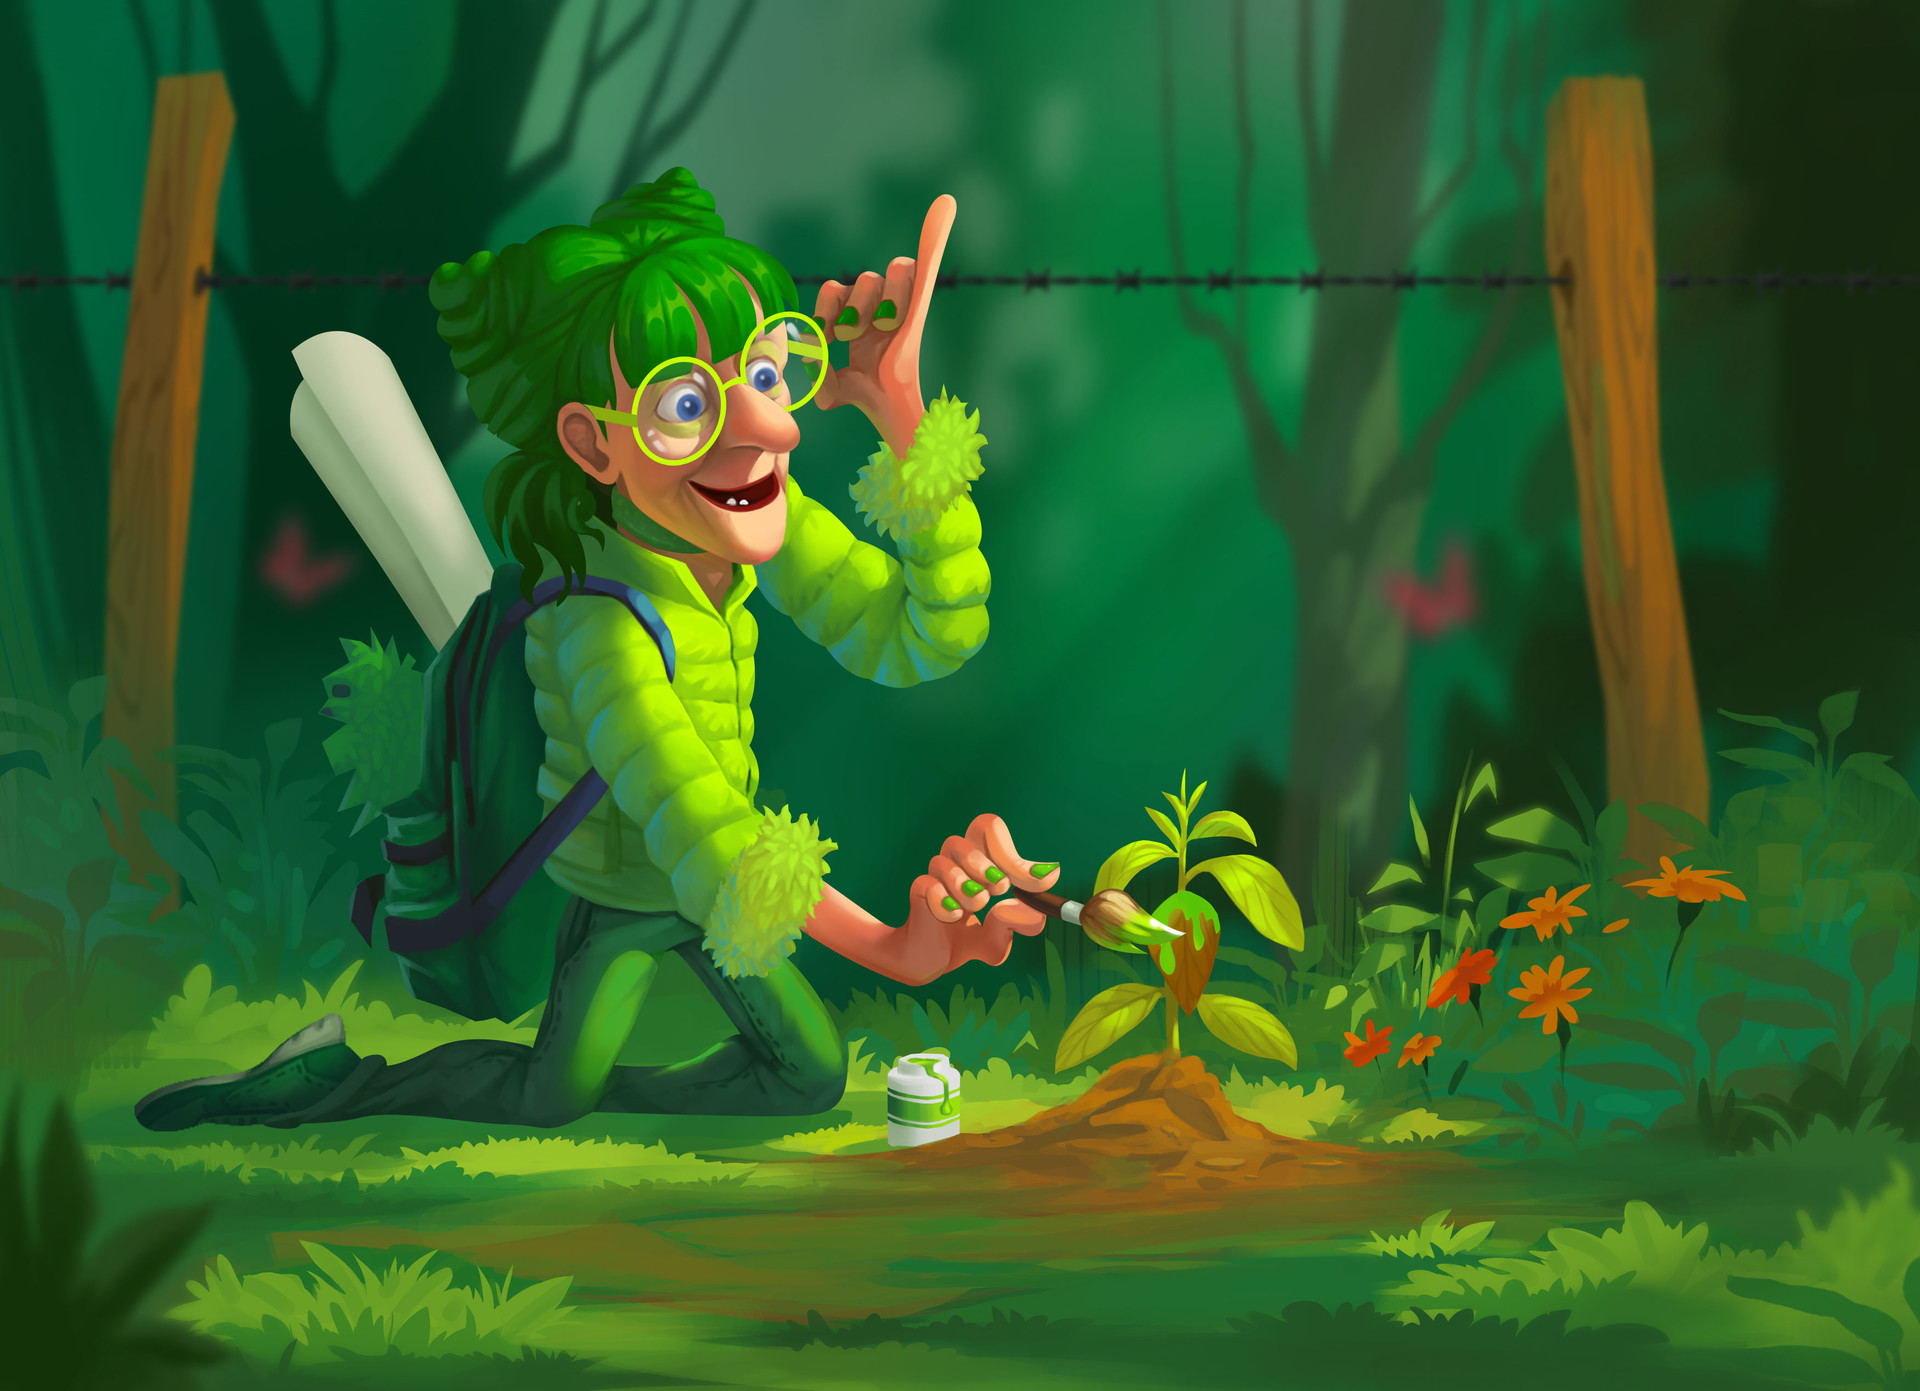 idesign green lady quy ba mau xanh 08